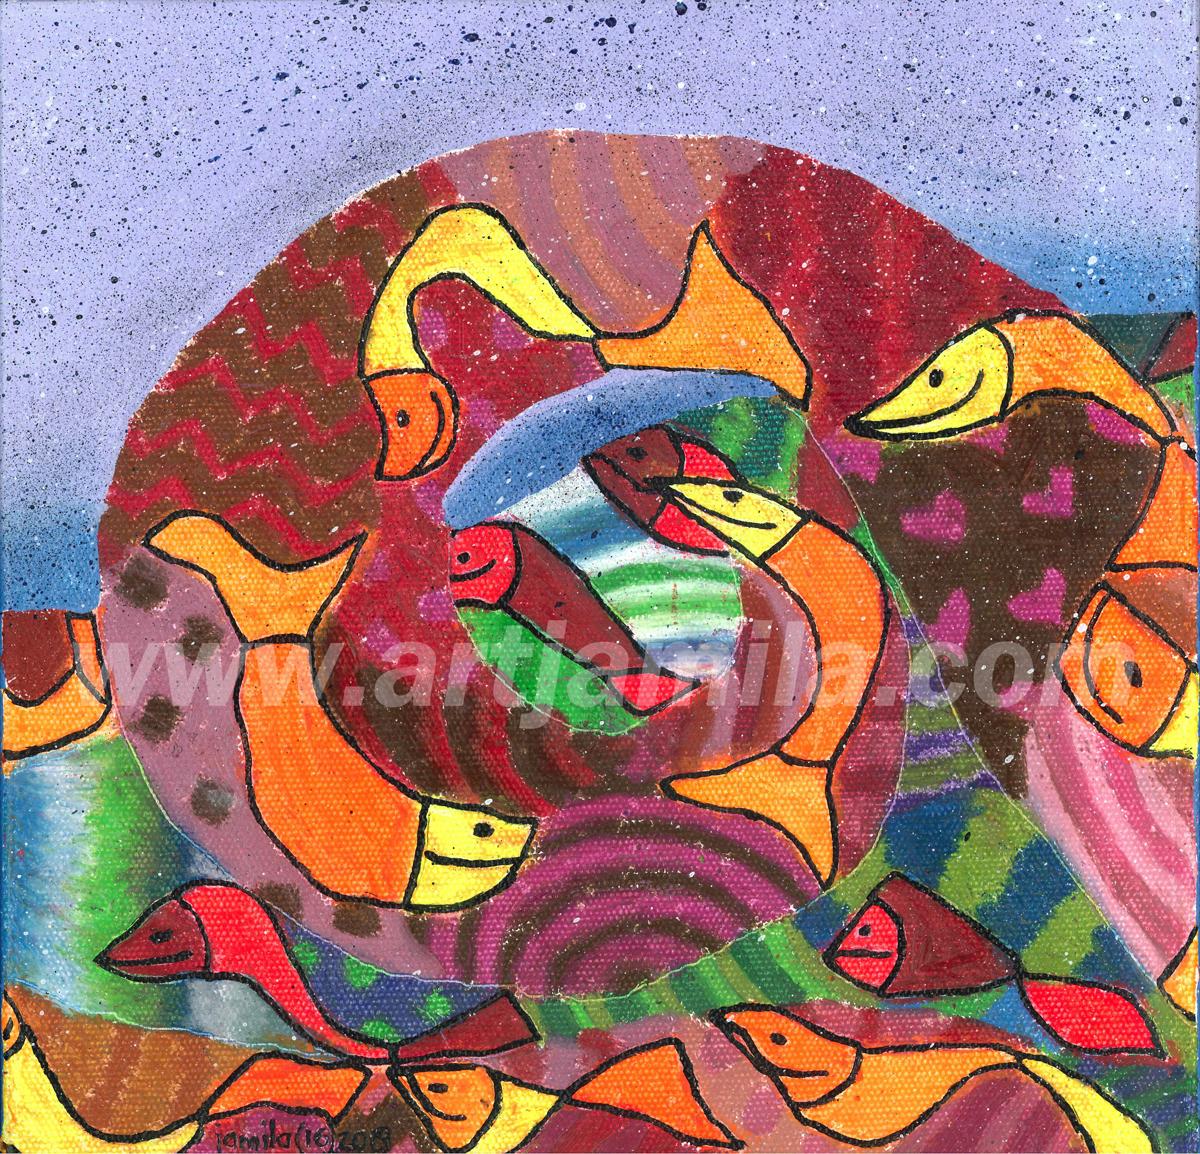 Fish Mosaic Wave Series 5B. 1x1. watermark